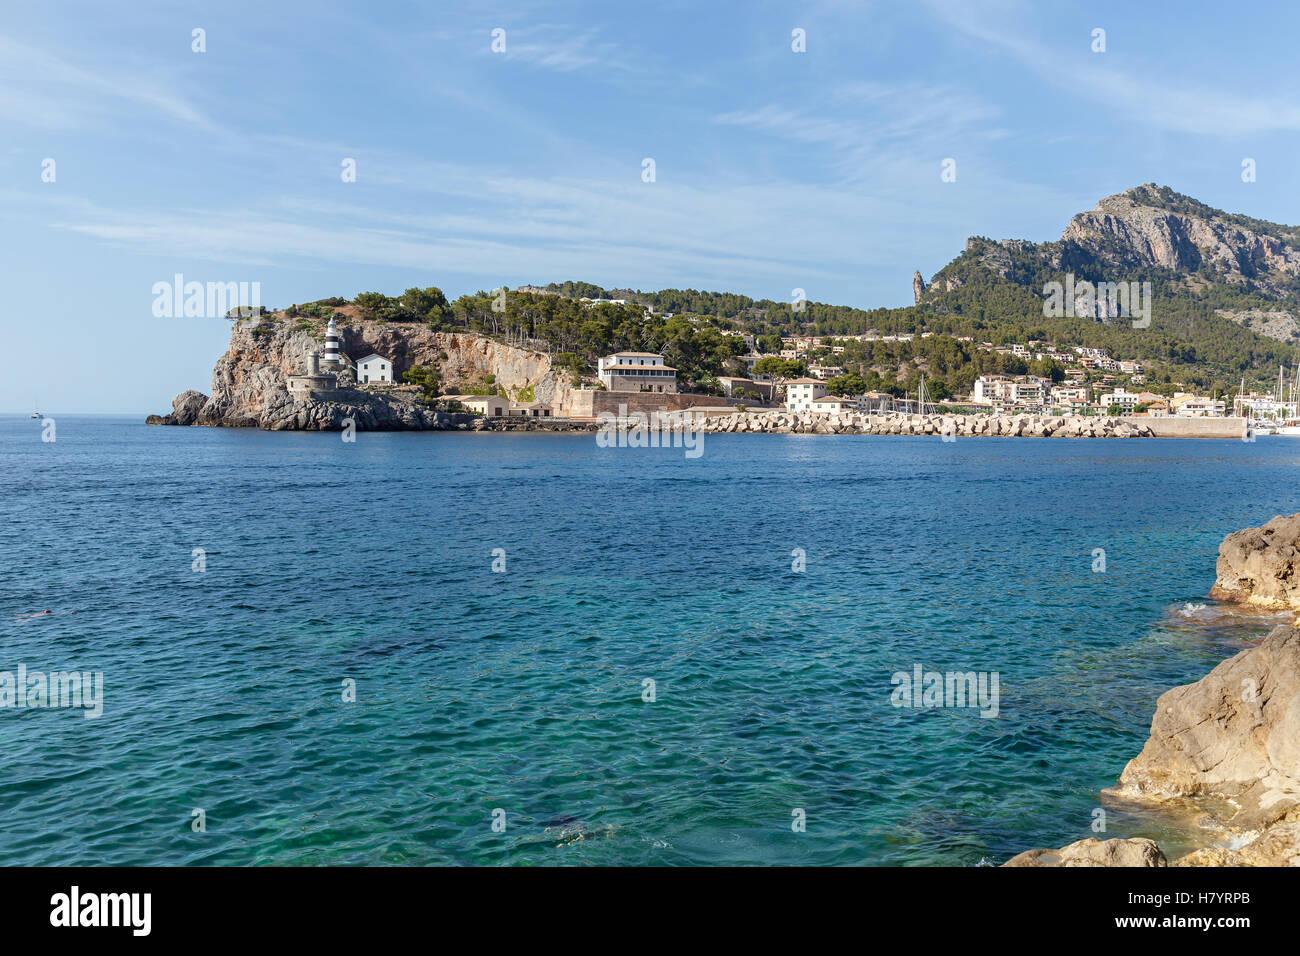 Vue de la côte de Majorque. Vue imprenable sur la côte de Majorque et de la surface de la mer , cliff Photo Stock